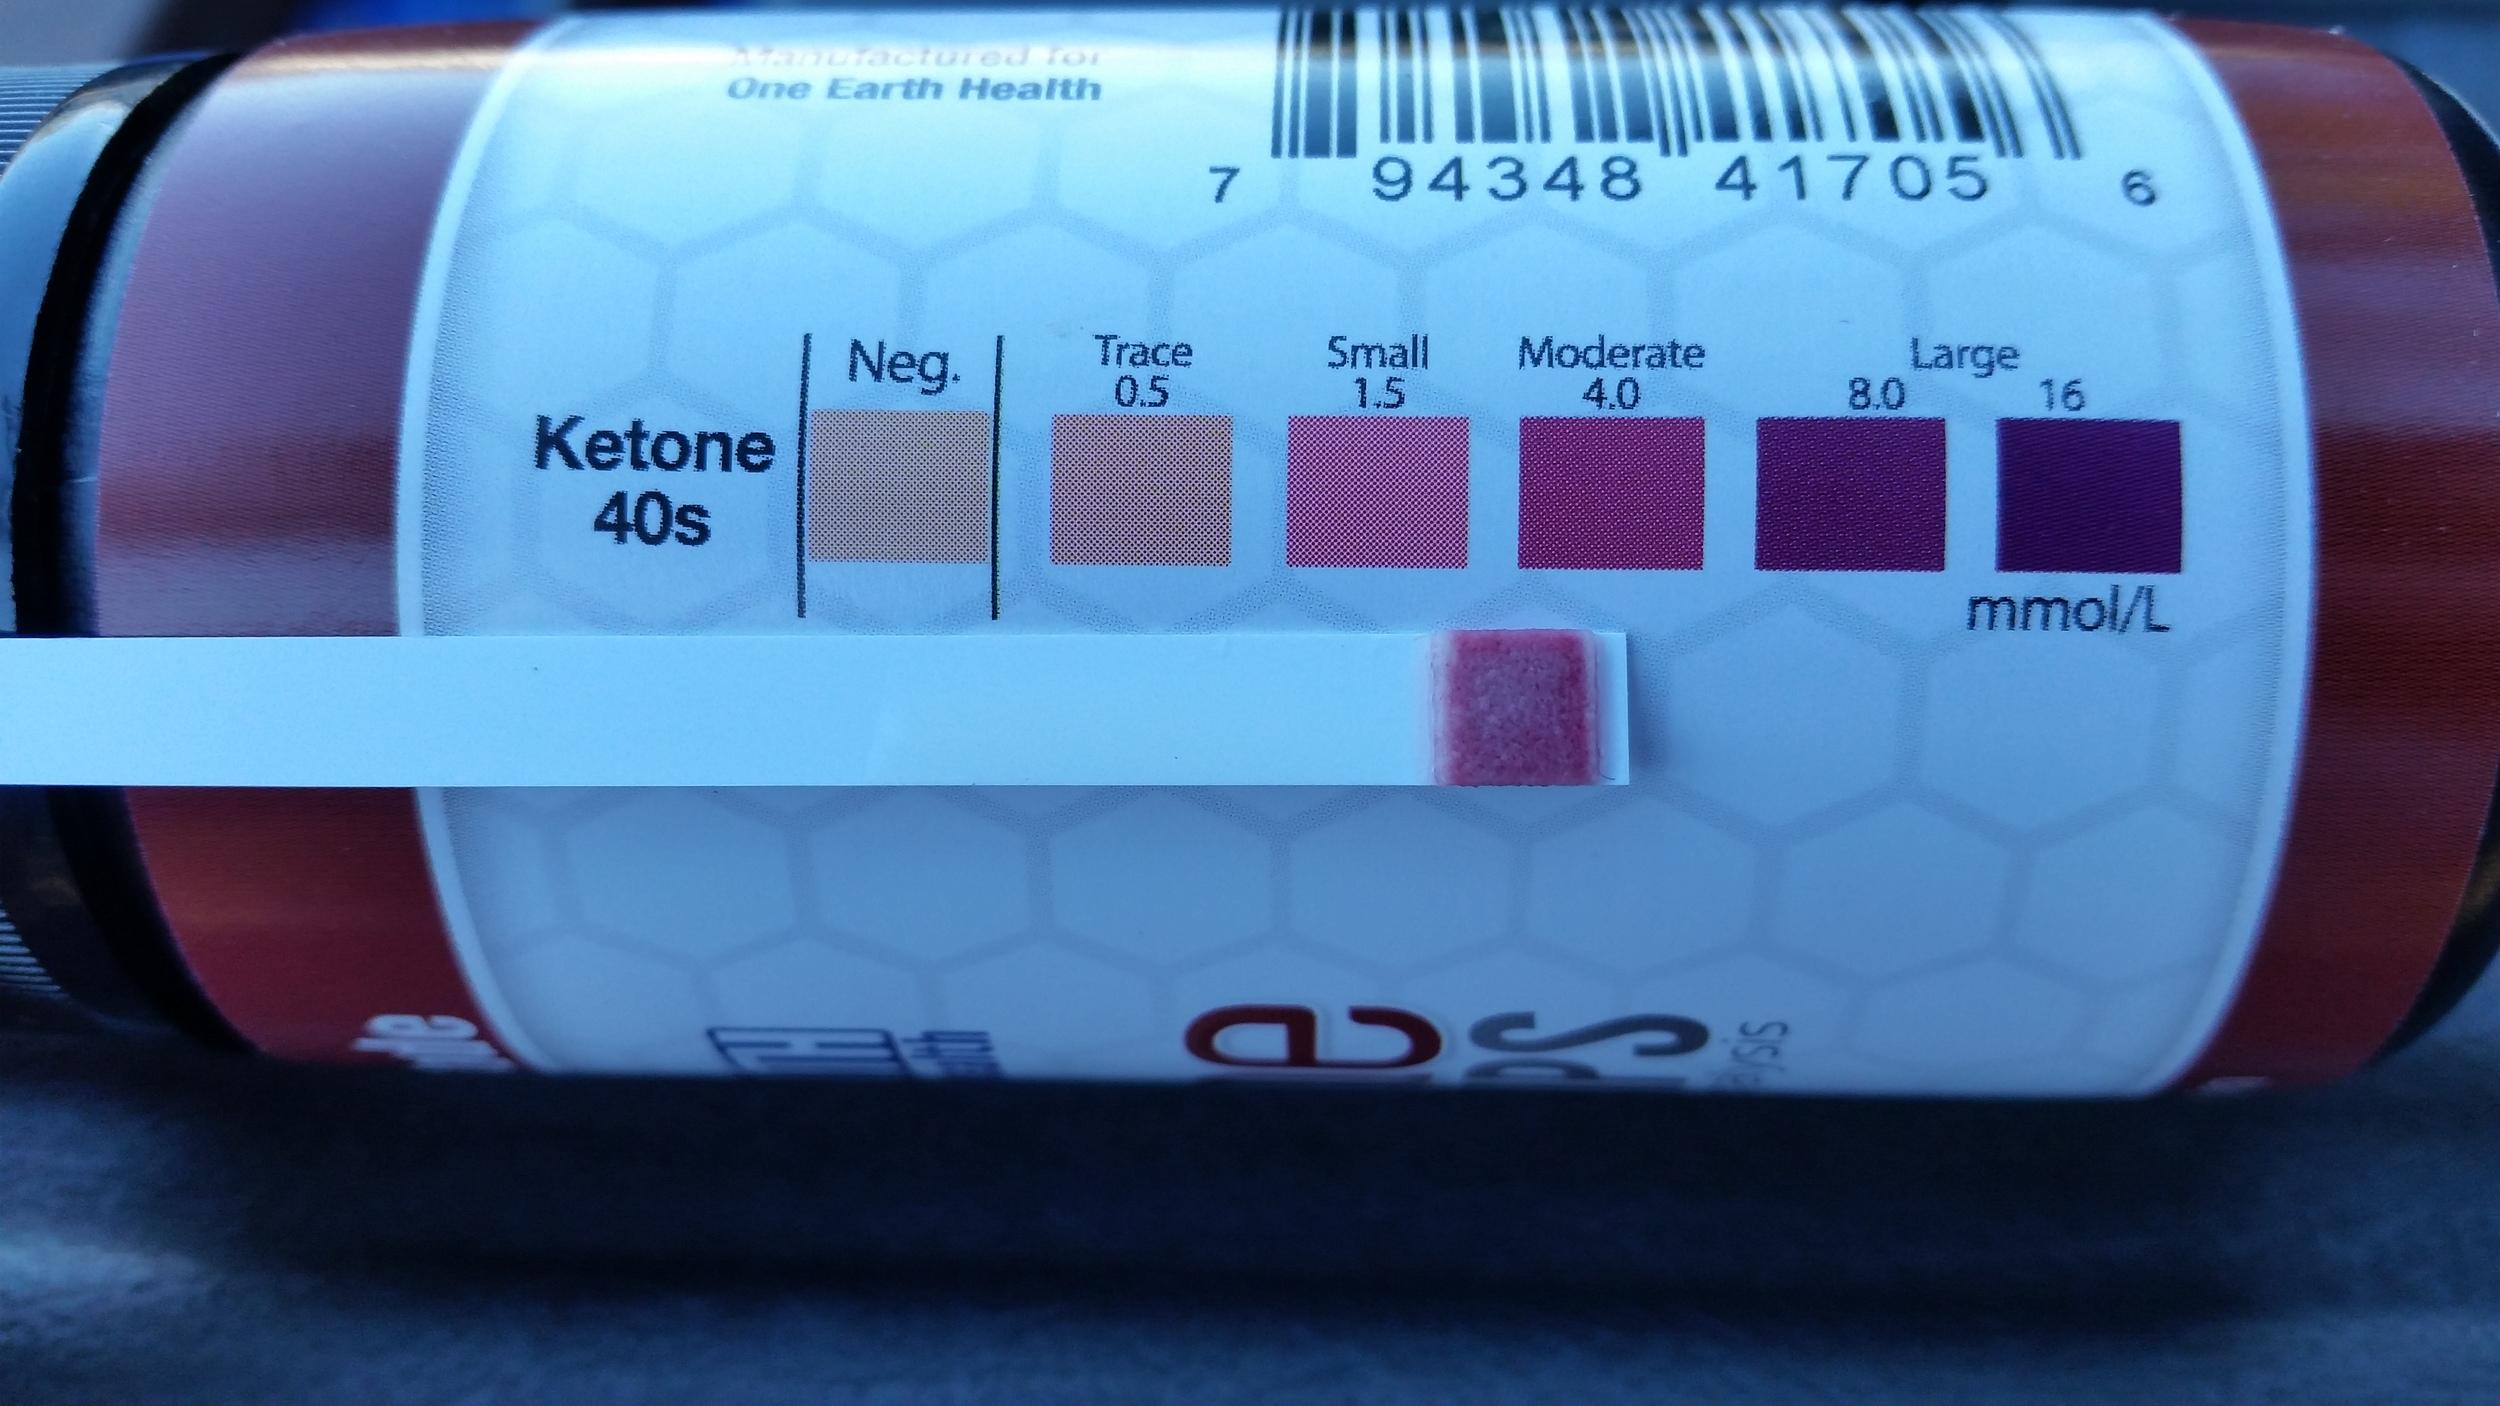 ketone test 0127-01